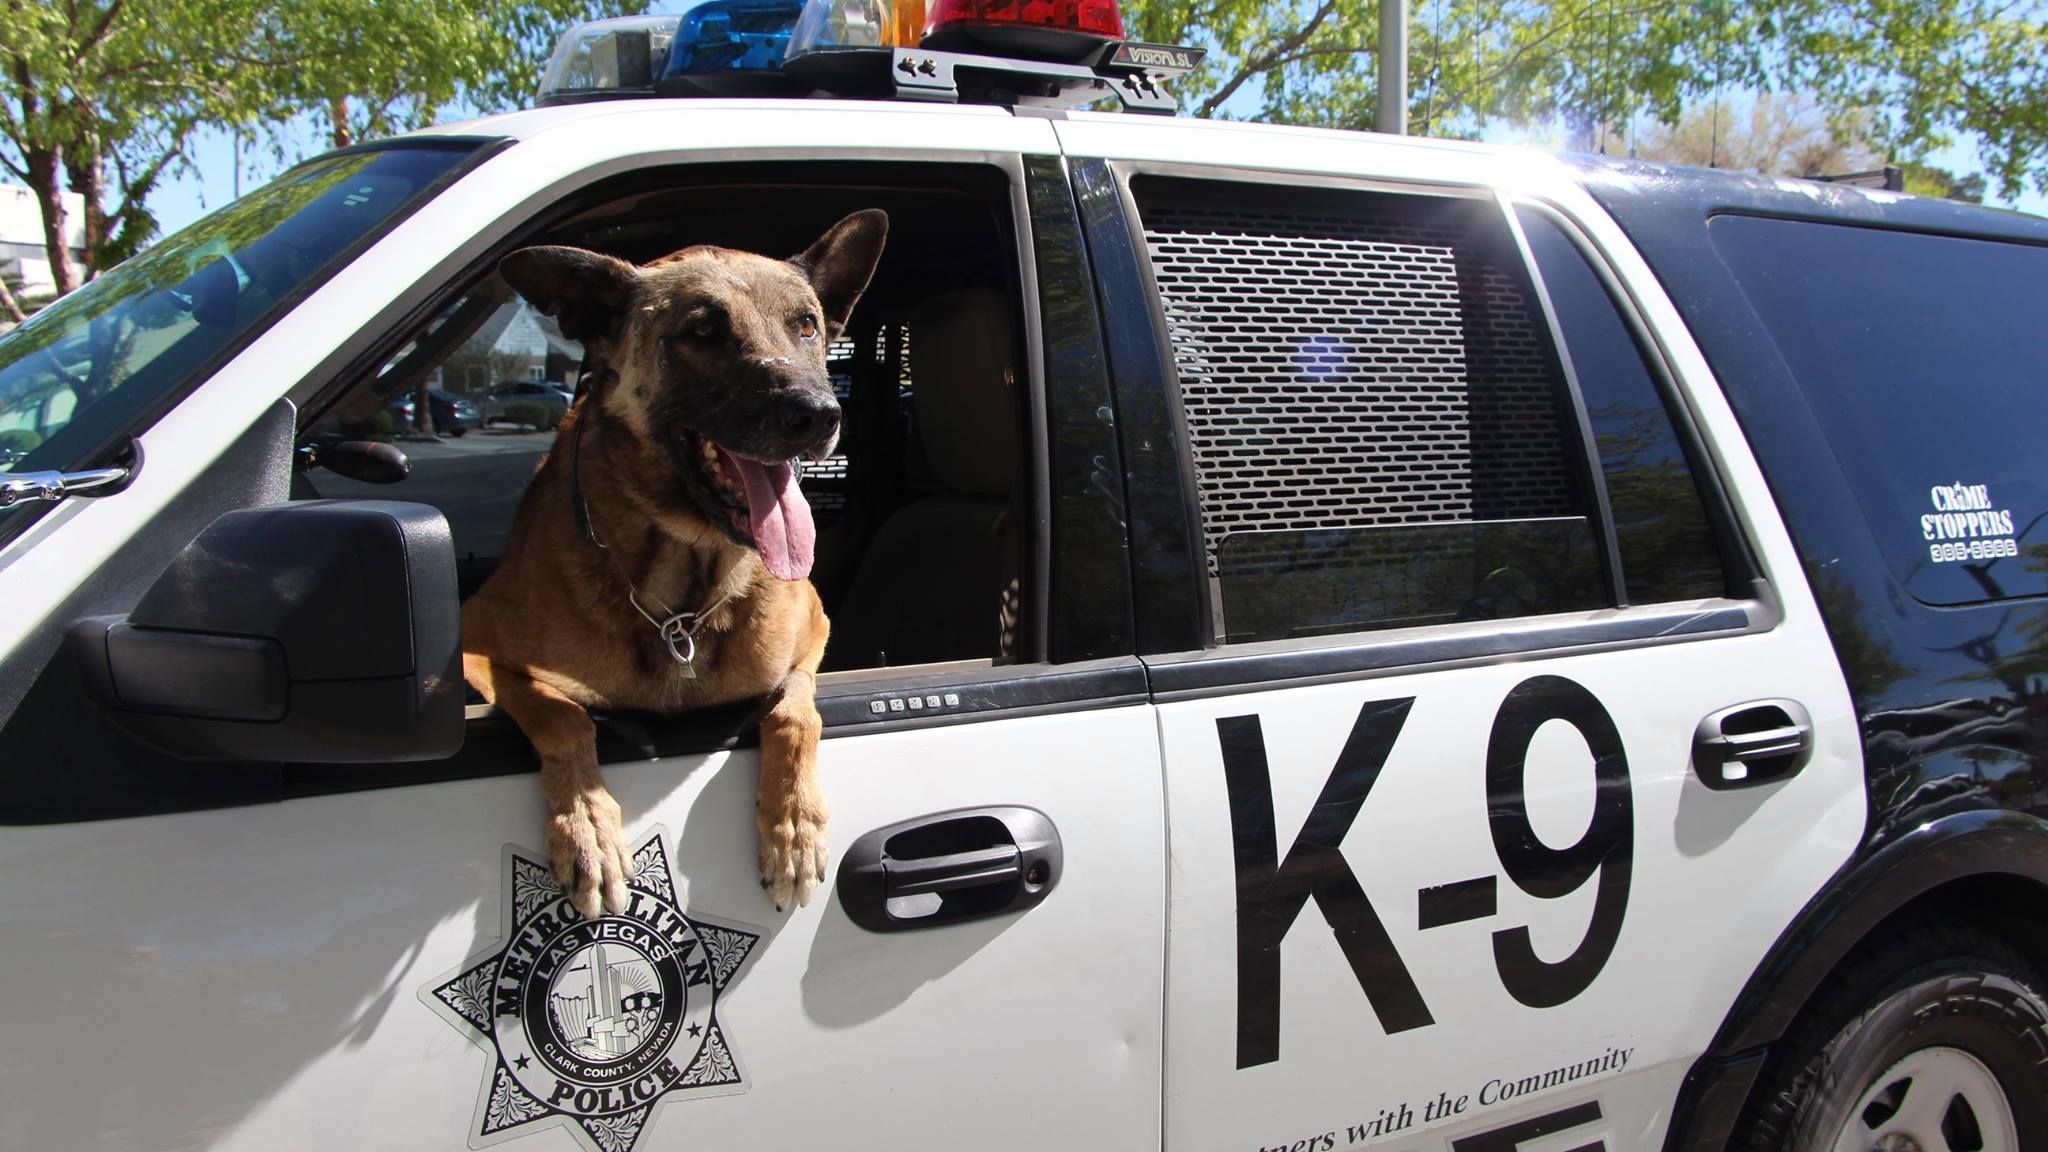 K9 nicky with las vegas metro police department was killed